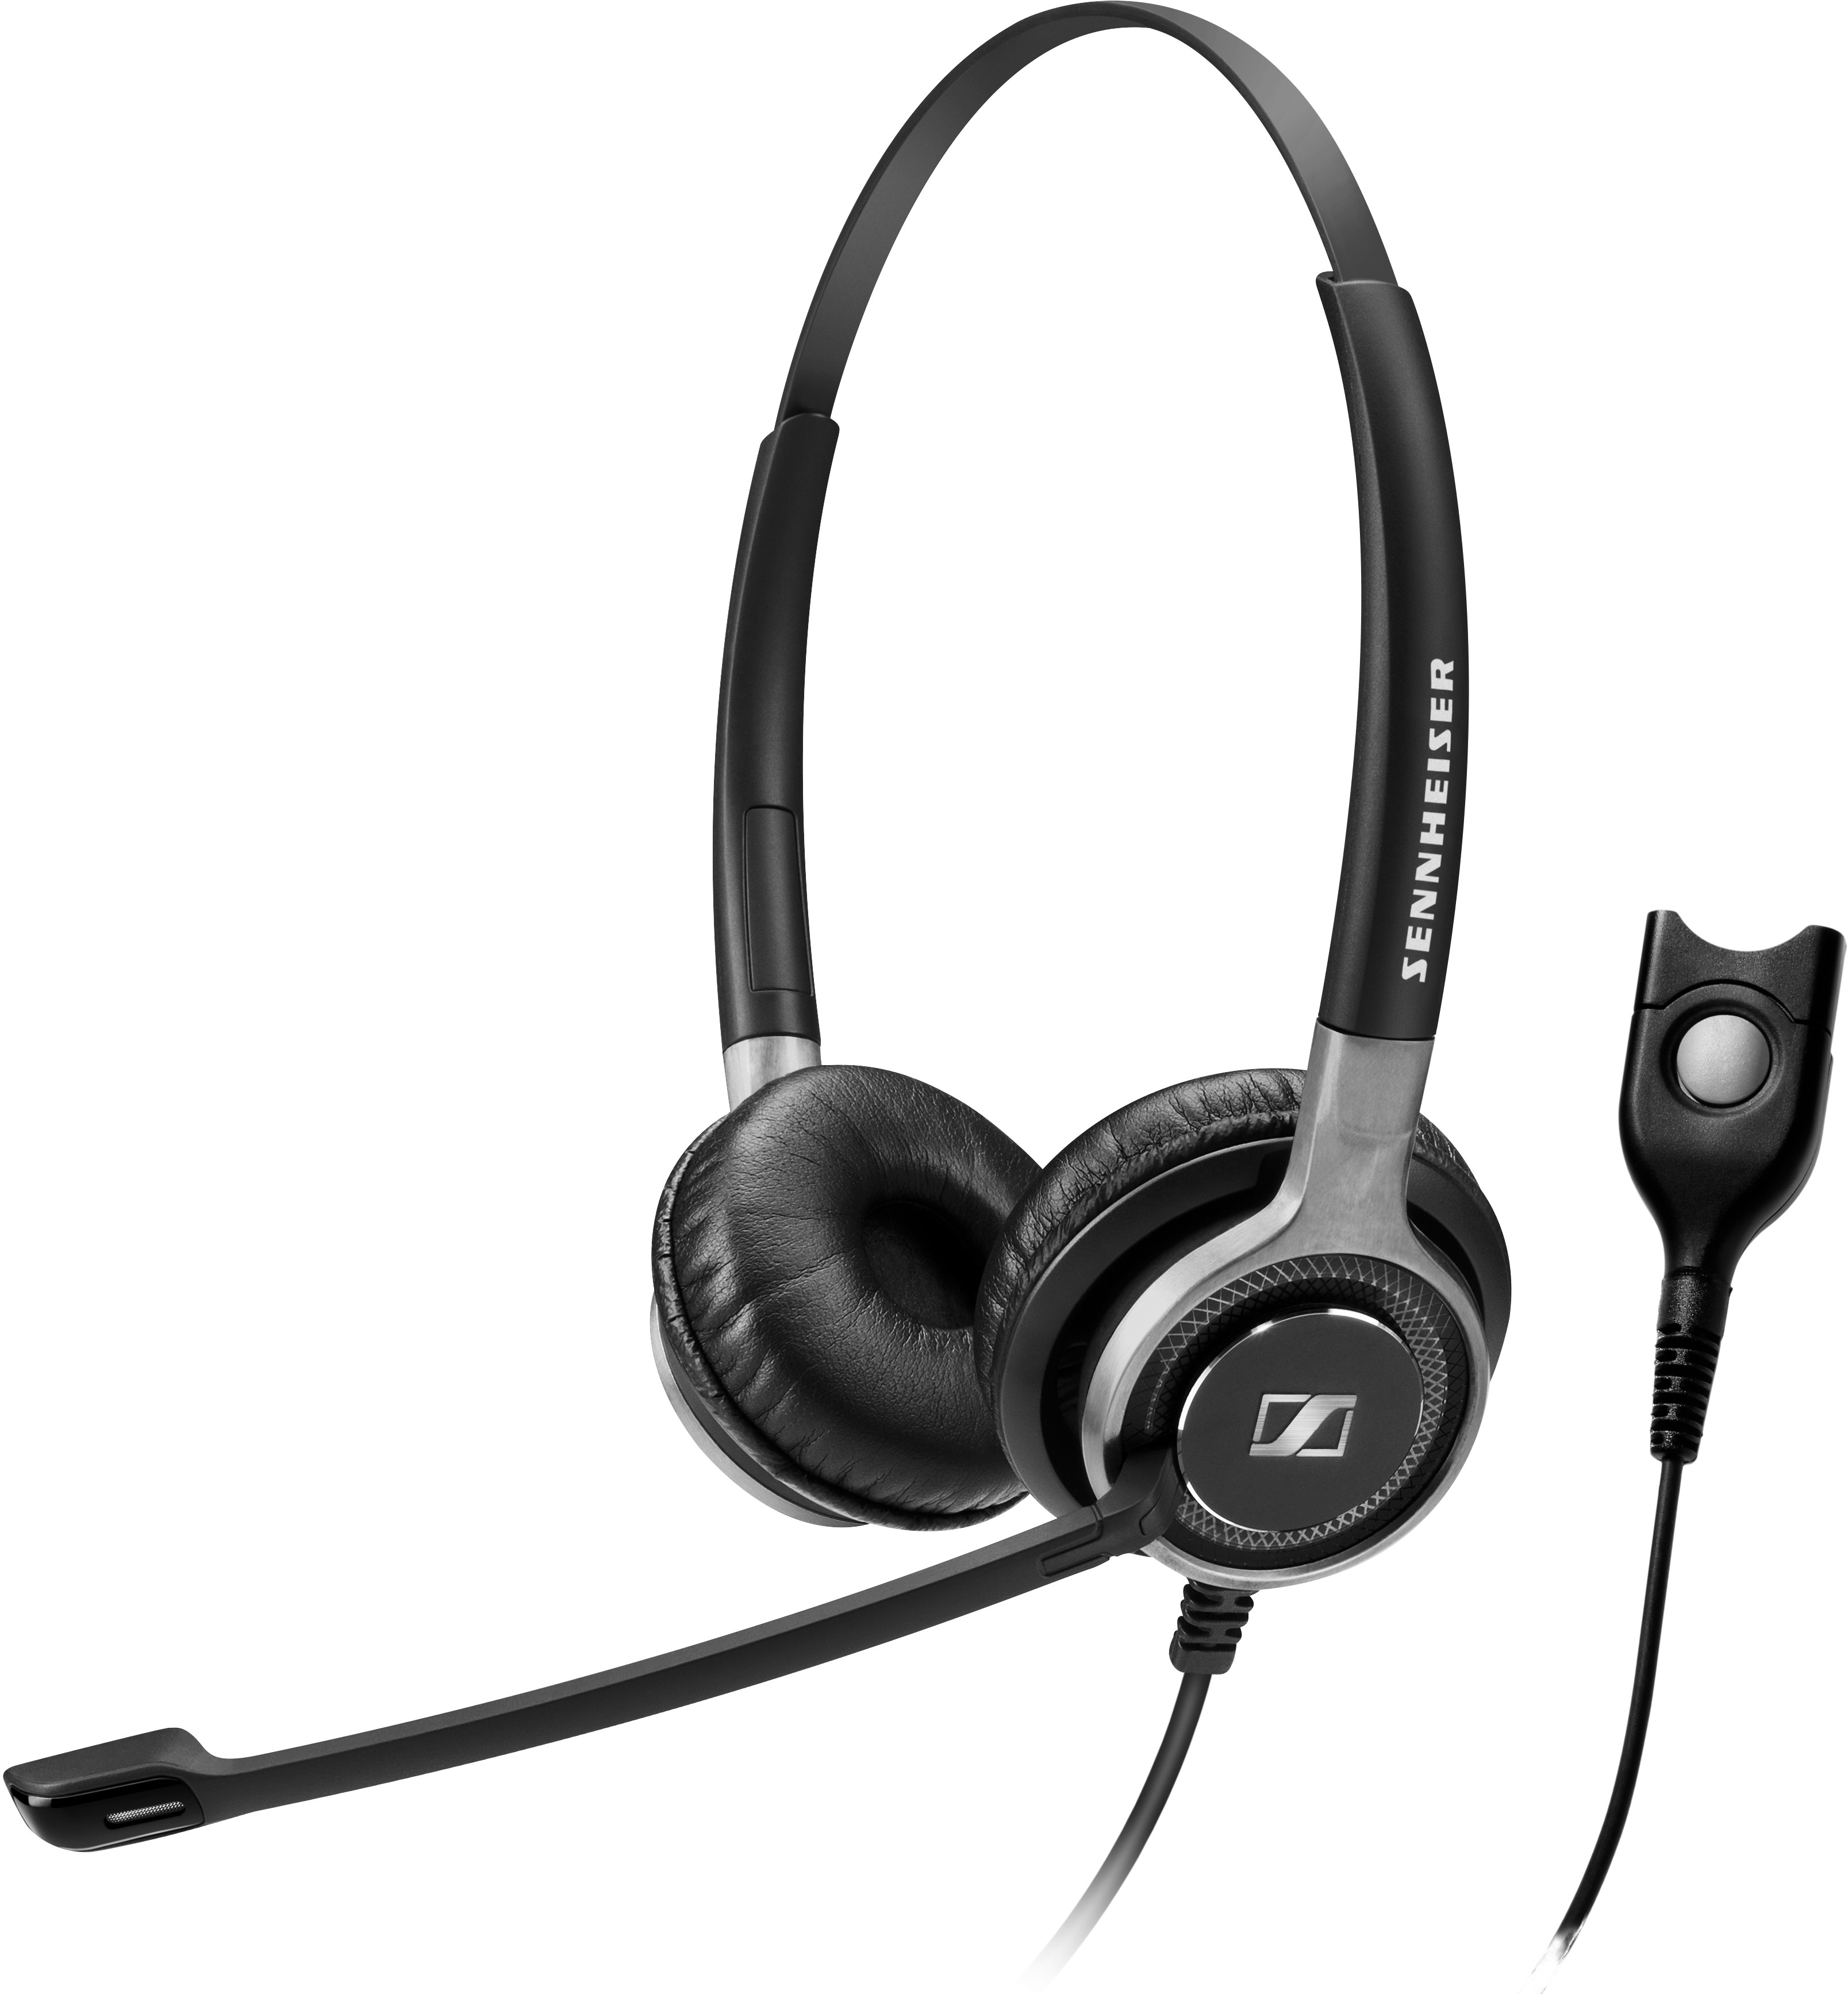 Sennheiser SC660 Binaural Noise Cancelling Headset